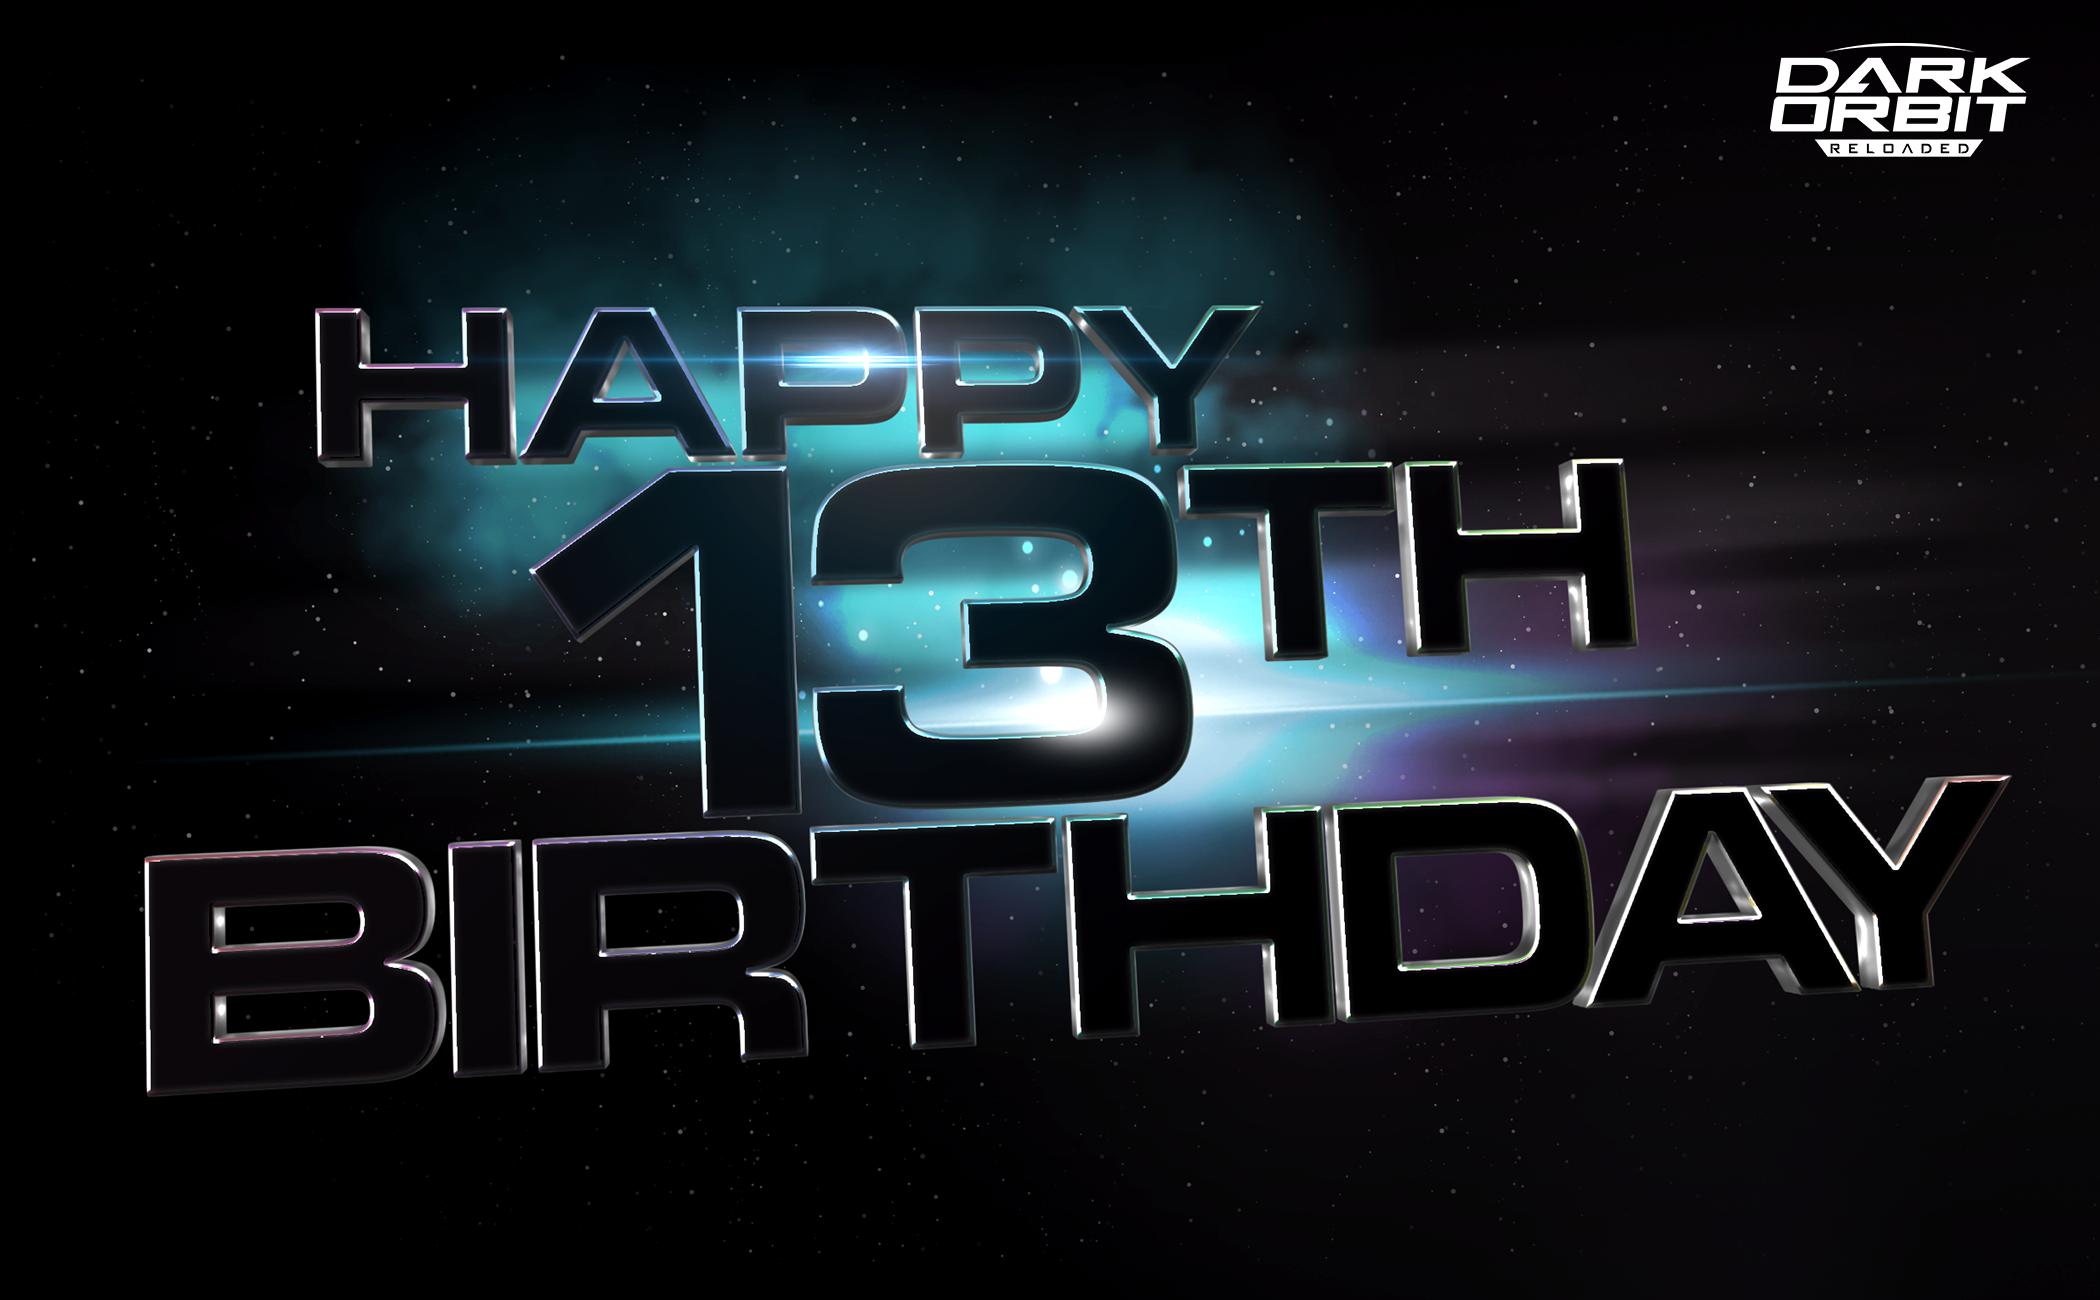 DO_marketing_13th-birthday_2019.png